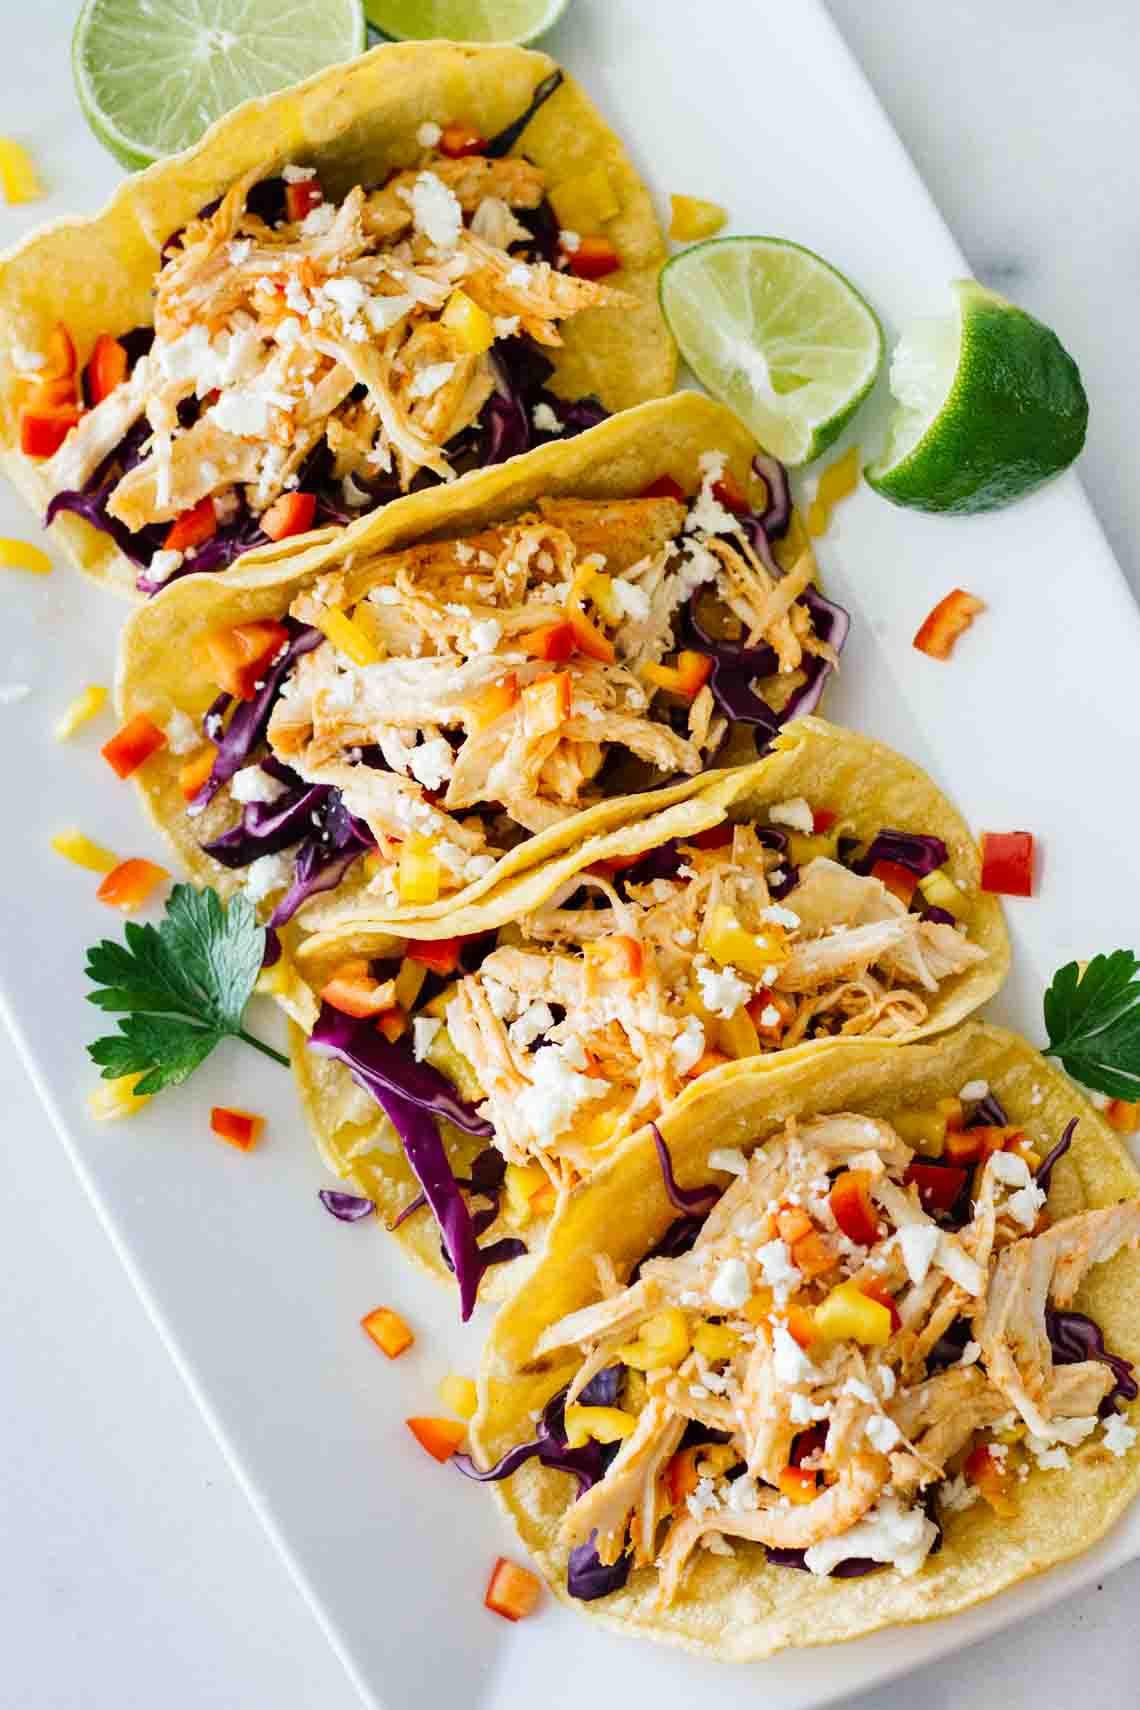 Simple Healthy Dinners  Healthy Sriracha Shredded Chicken Tacos Jar Lemons